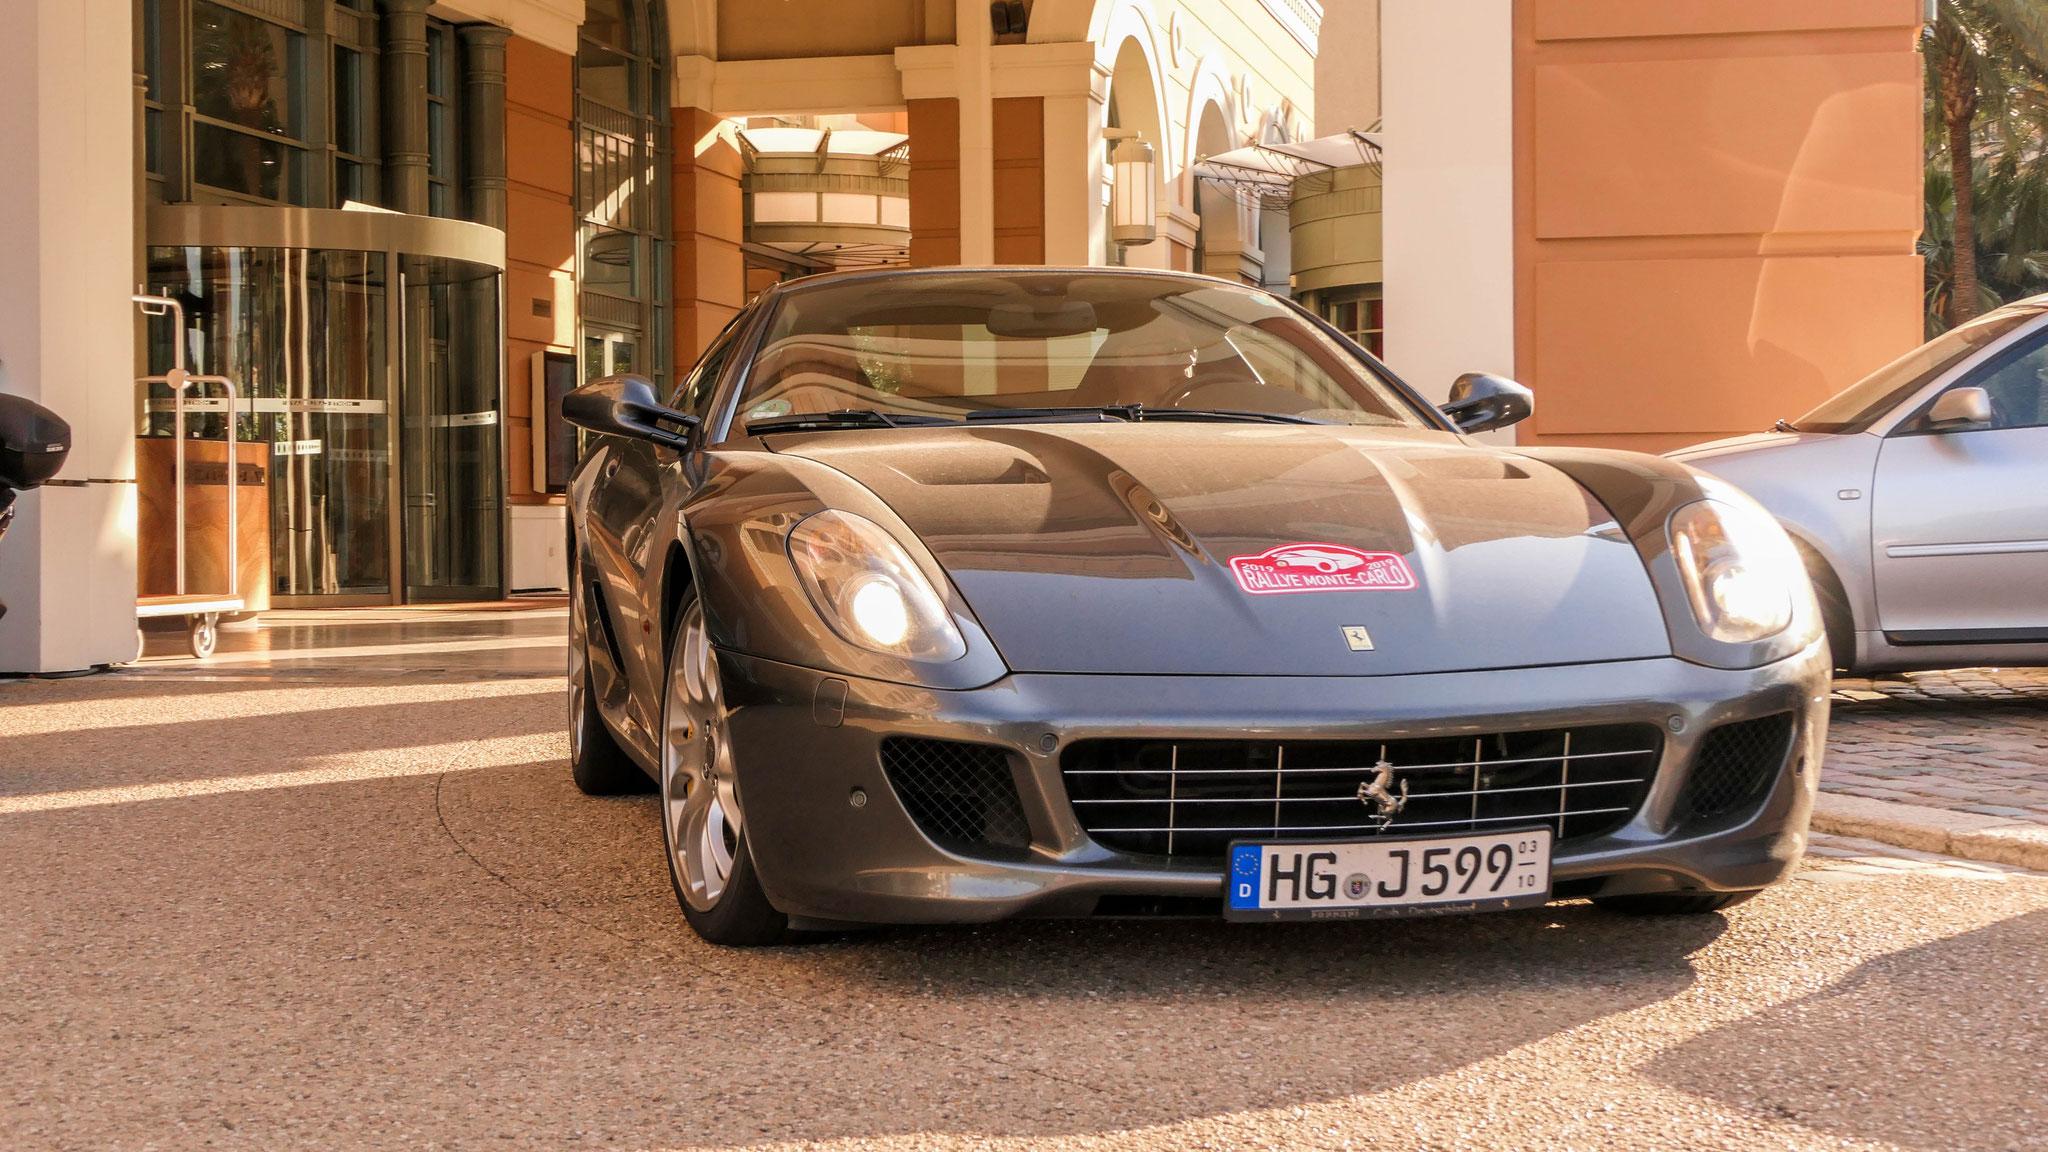 Ferrari 599 GTB - HG-J-599